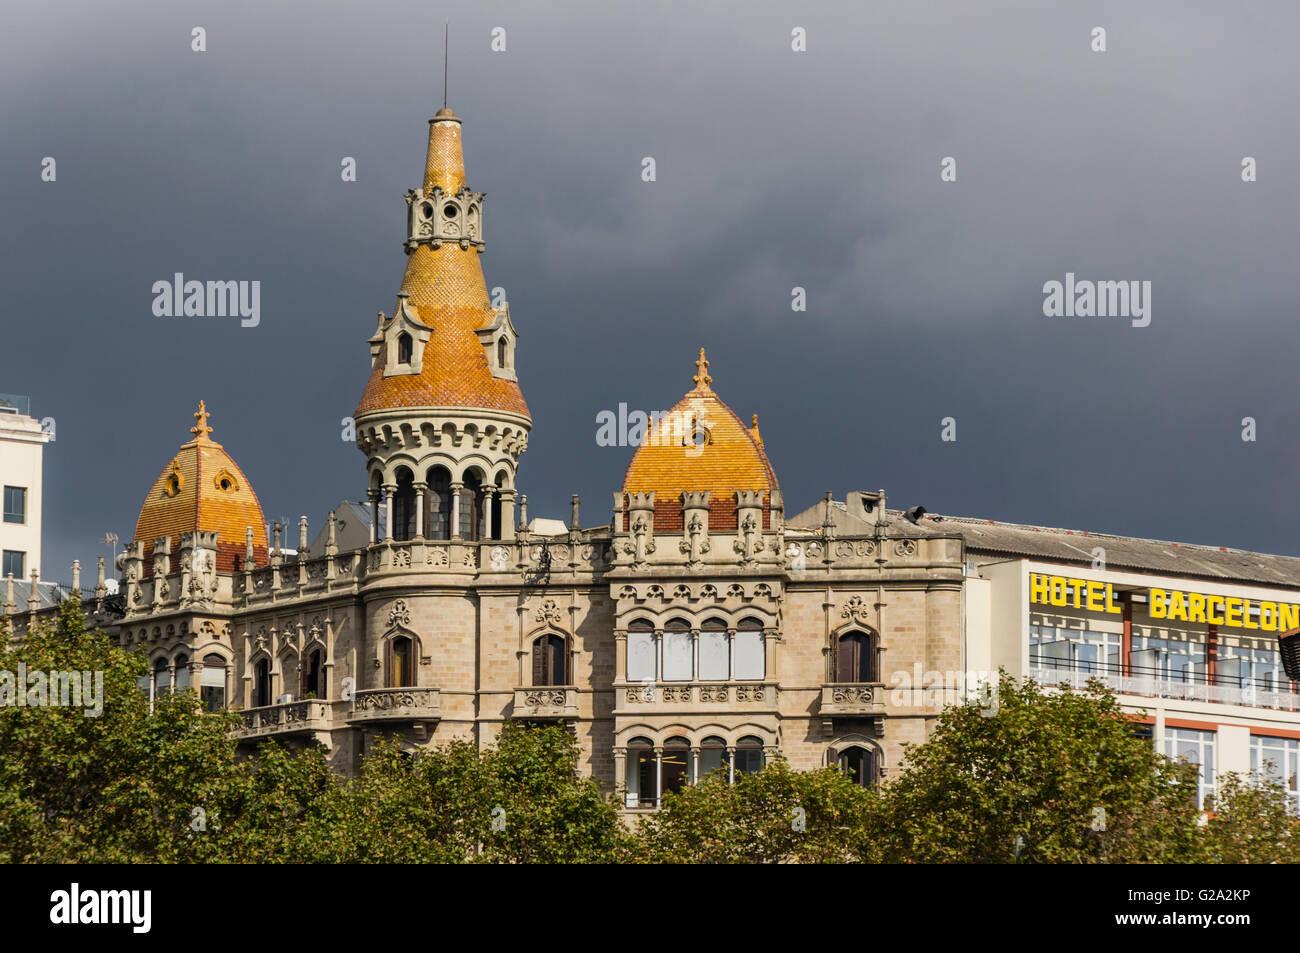 Fällen Rocamora, Teatre Tivoli, Theater, Hotel Barcelona, Plaça de Catalunya Katalonien, Barcelona, Katalonien, Stockbild